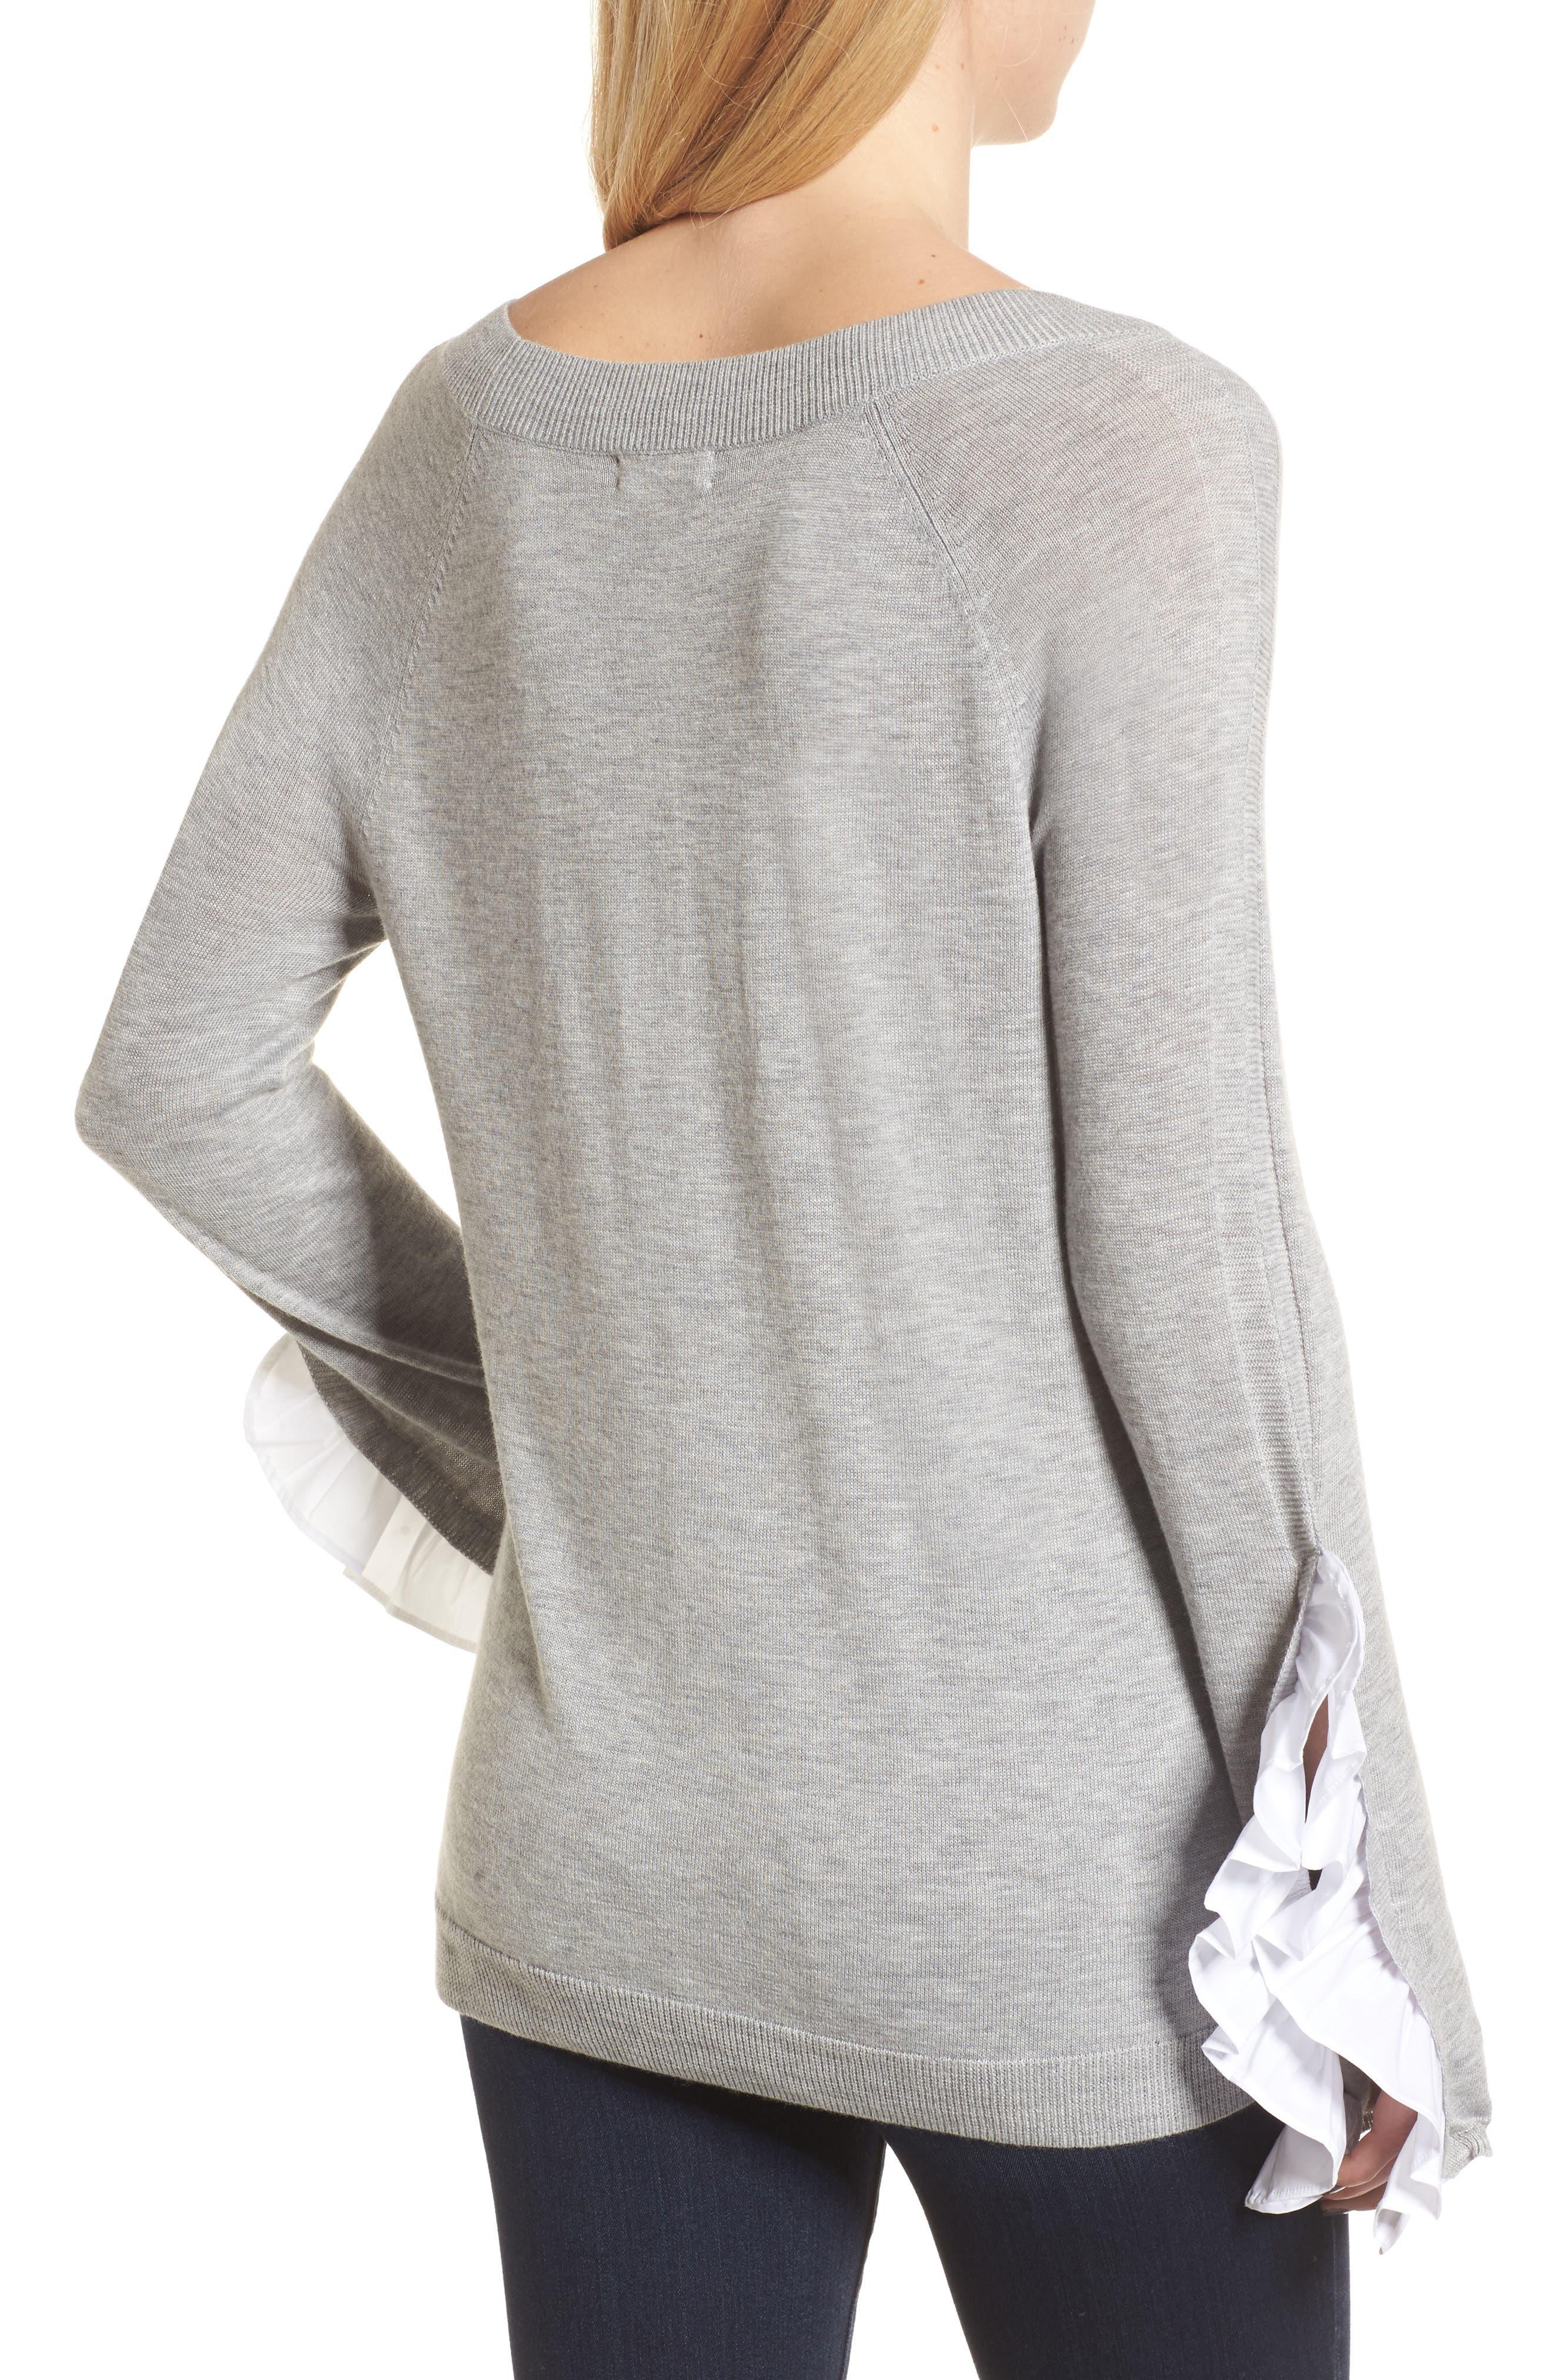 Ruffle Sleeve Sweater,                             Alternate thumbnail 2, color,                             Grey Heather